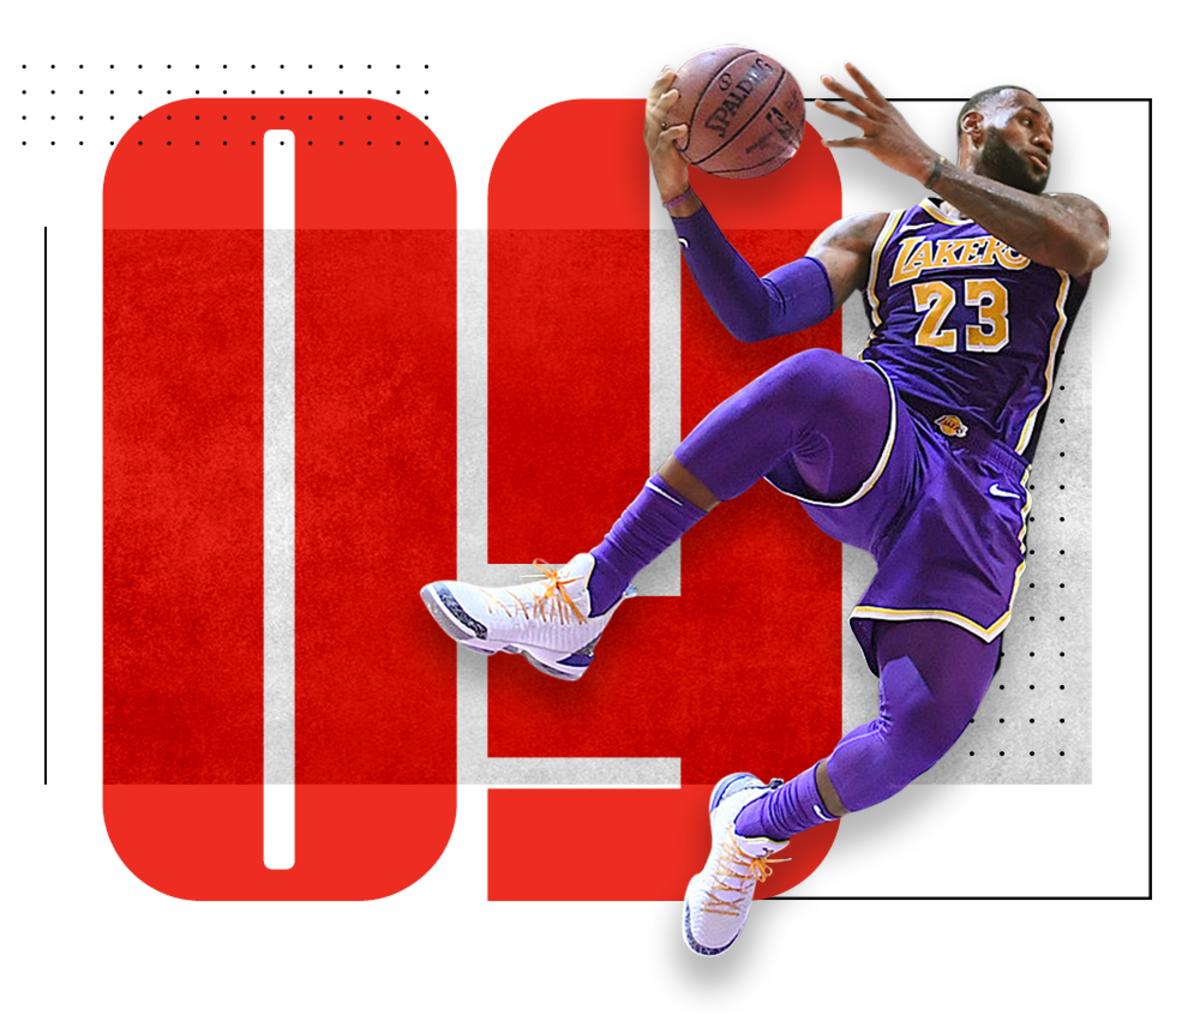 top-100-nba-players-2020-Lebron-James.png